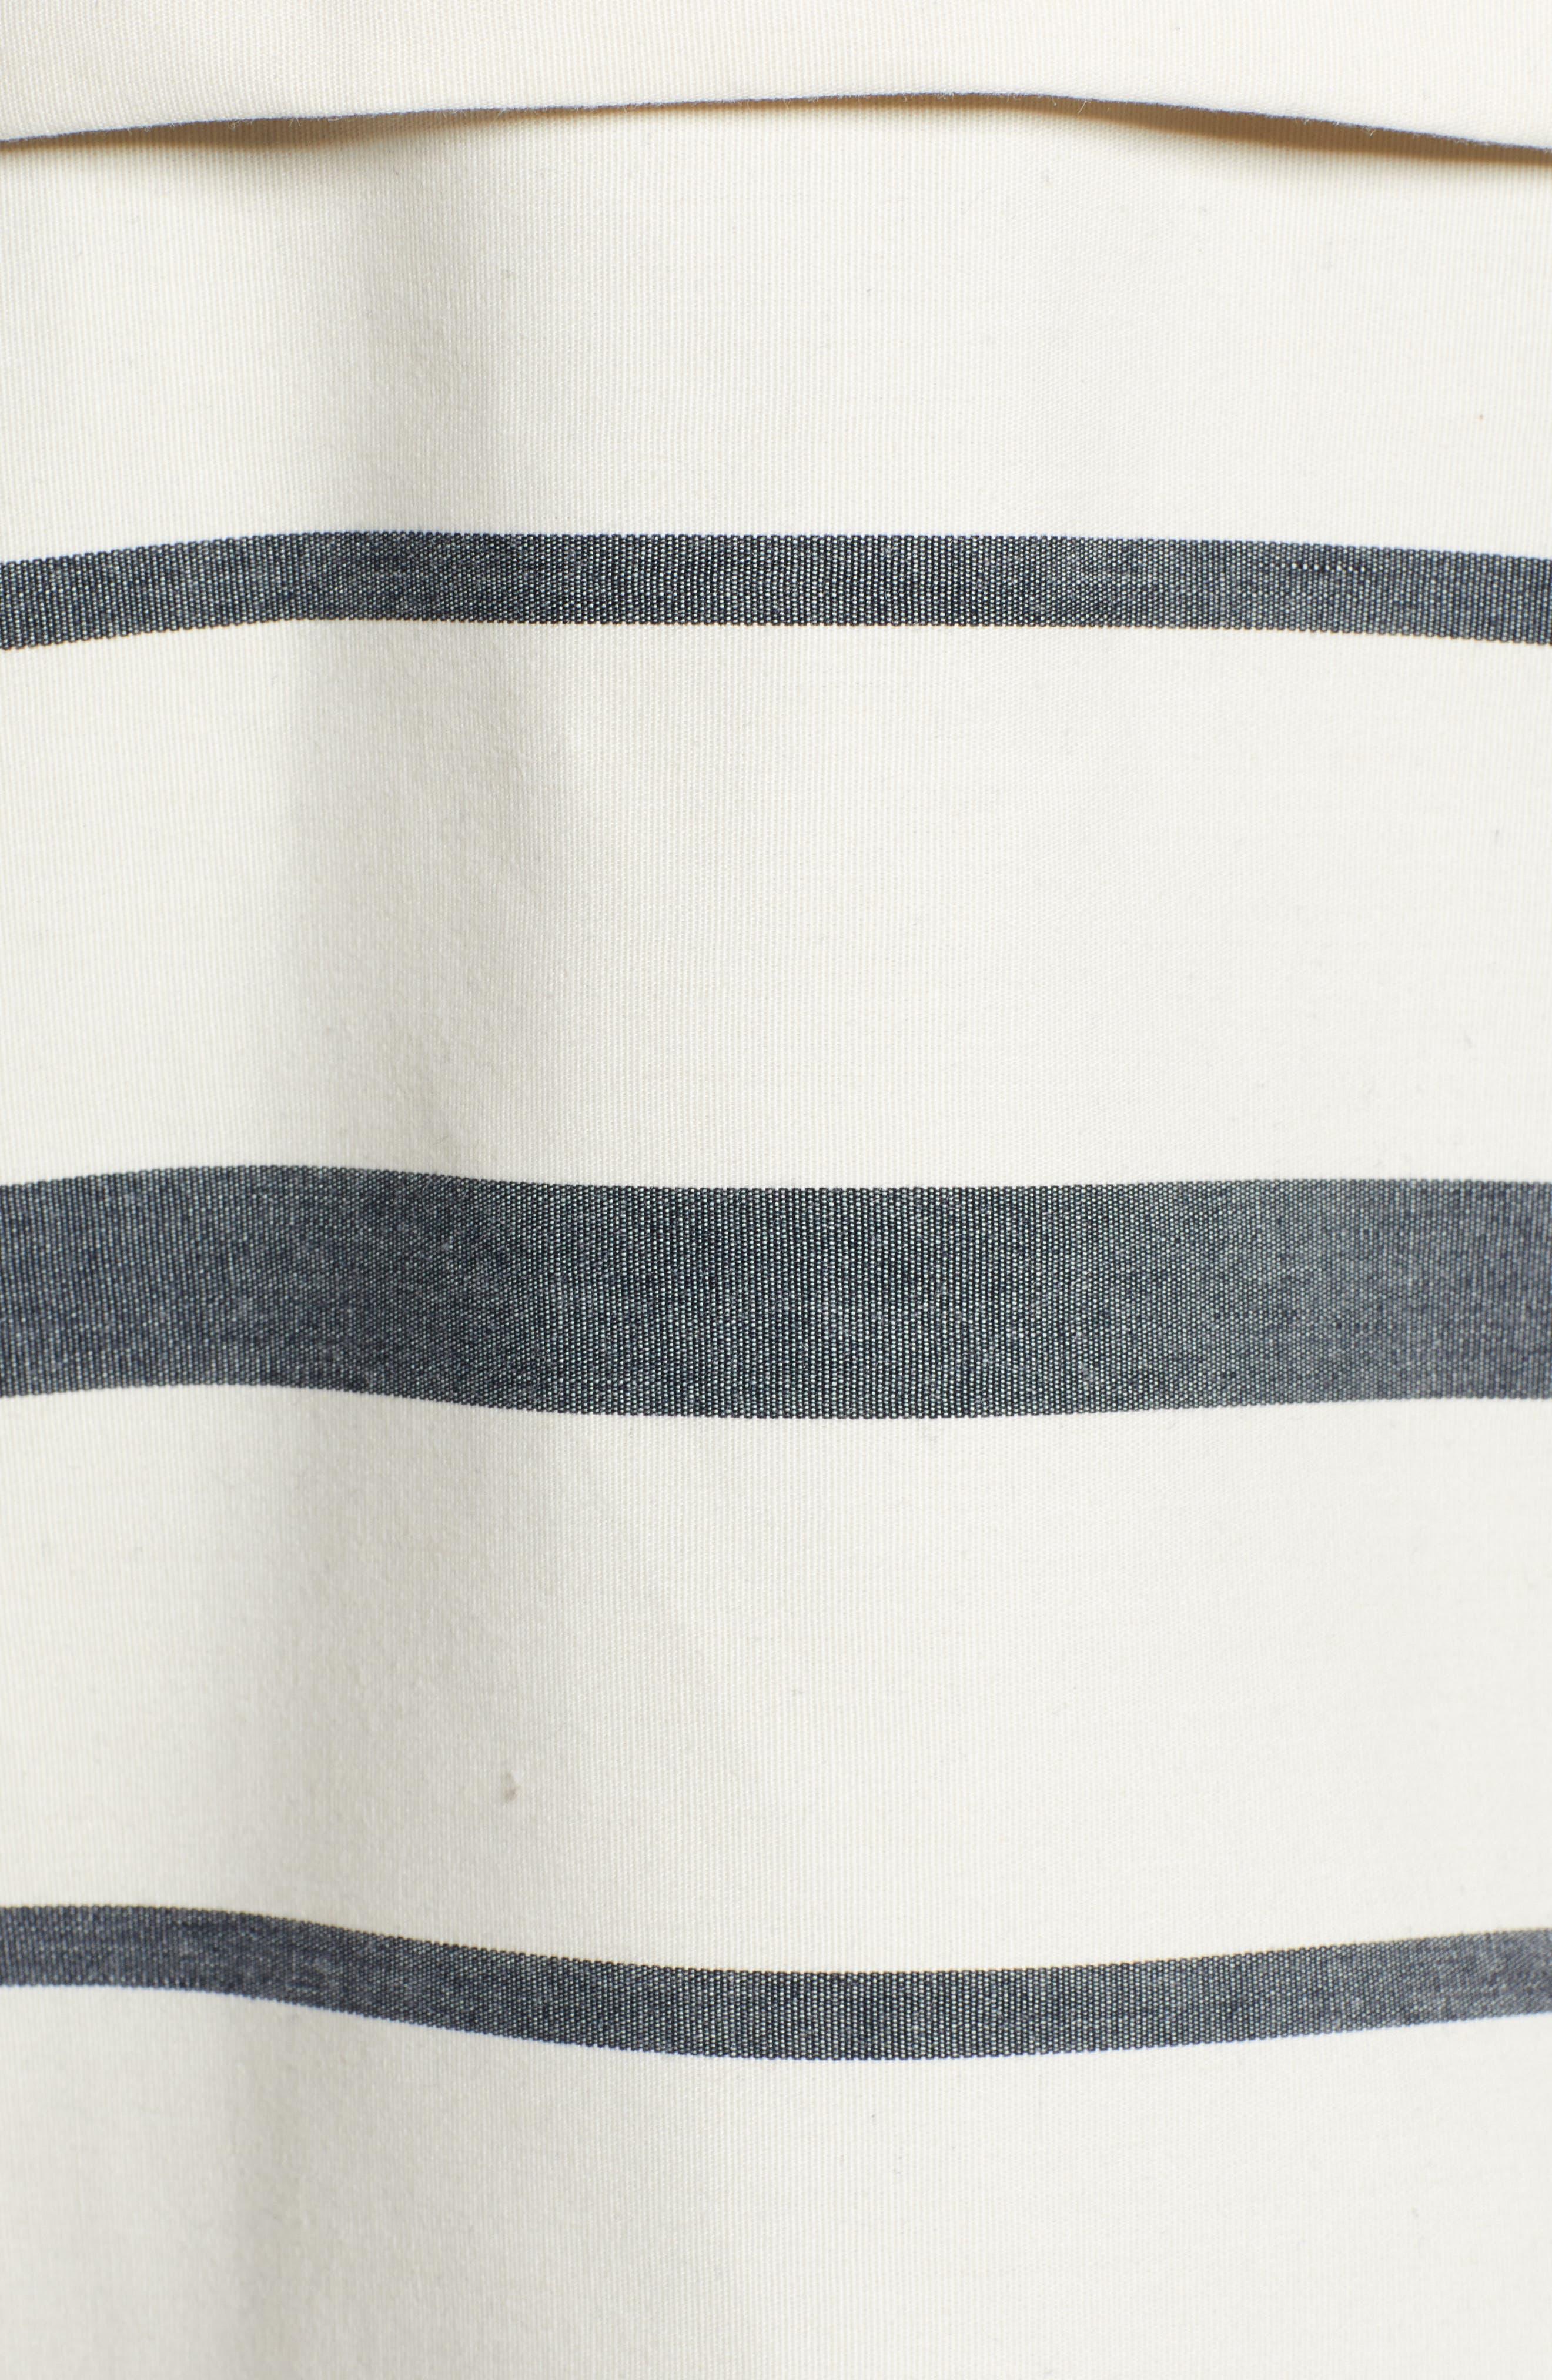 THREAD & SUPPLY, Portside Rain Jacket, Alternate thumbnail 6, color, BLACK WHITE STRIPE